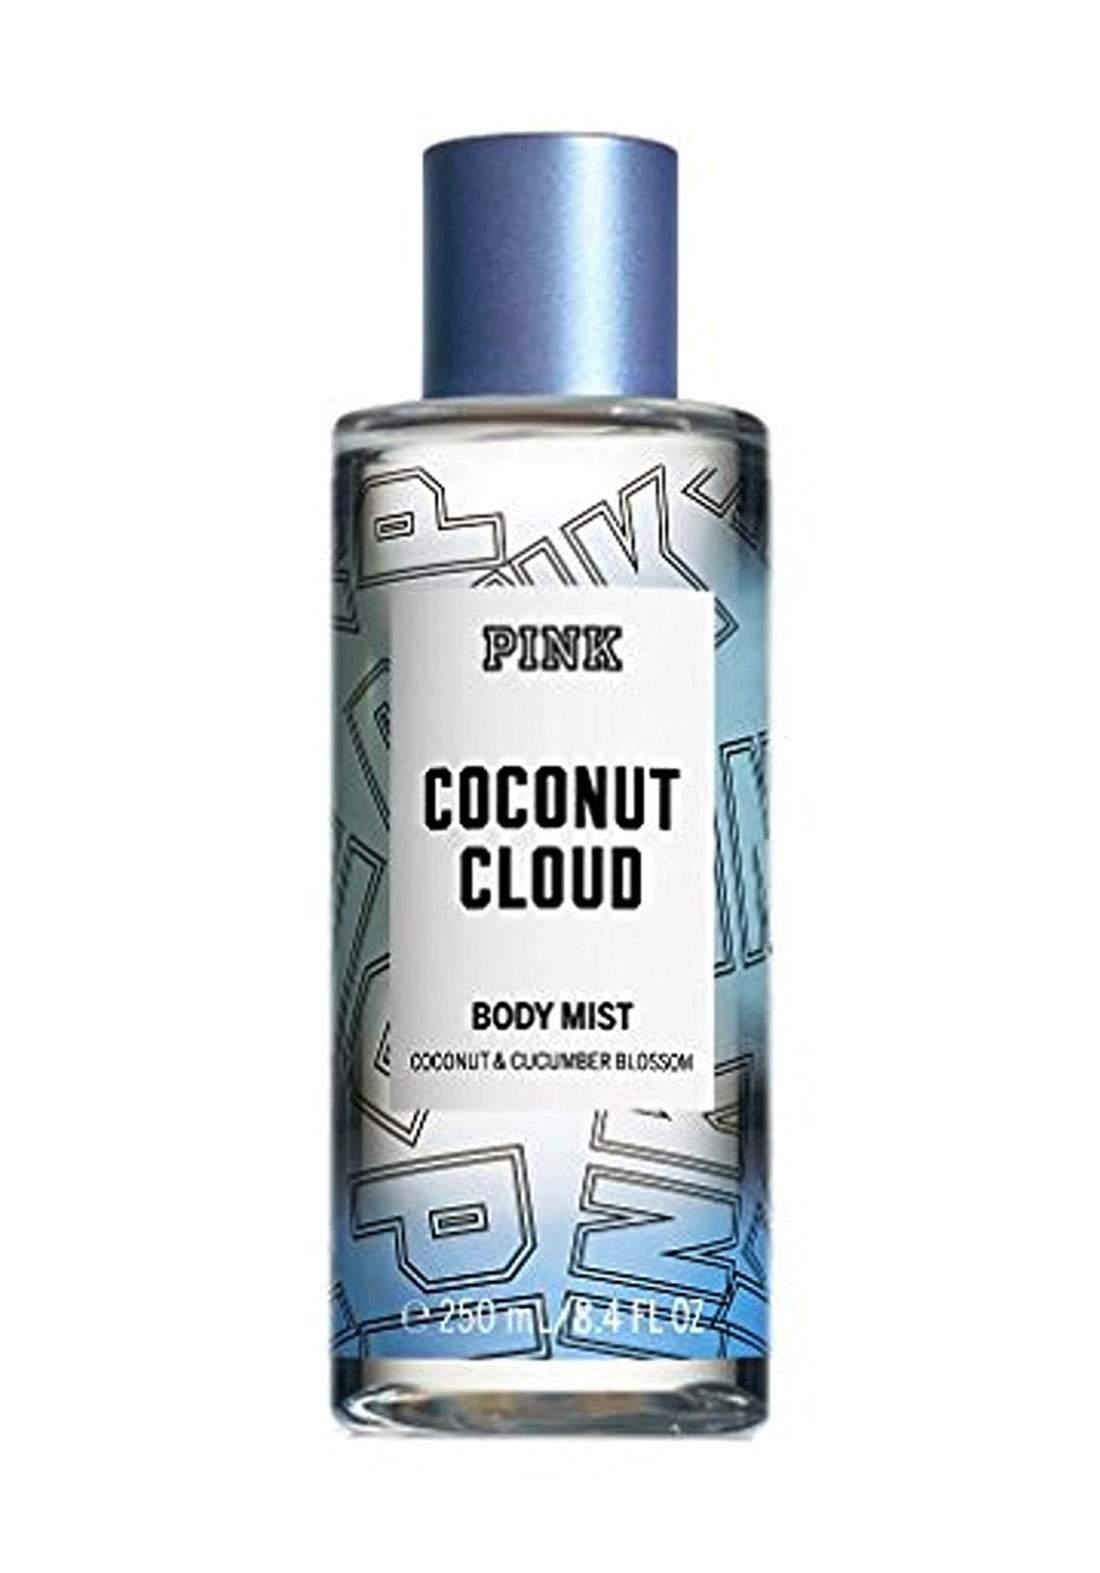 3 Victorias Secret Pink Coconut Cloud Body Mist Spray Fragrance Cucumber Blossom 250Ml سبلاش جسم